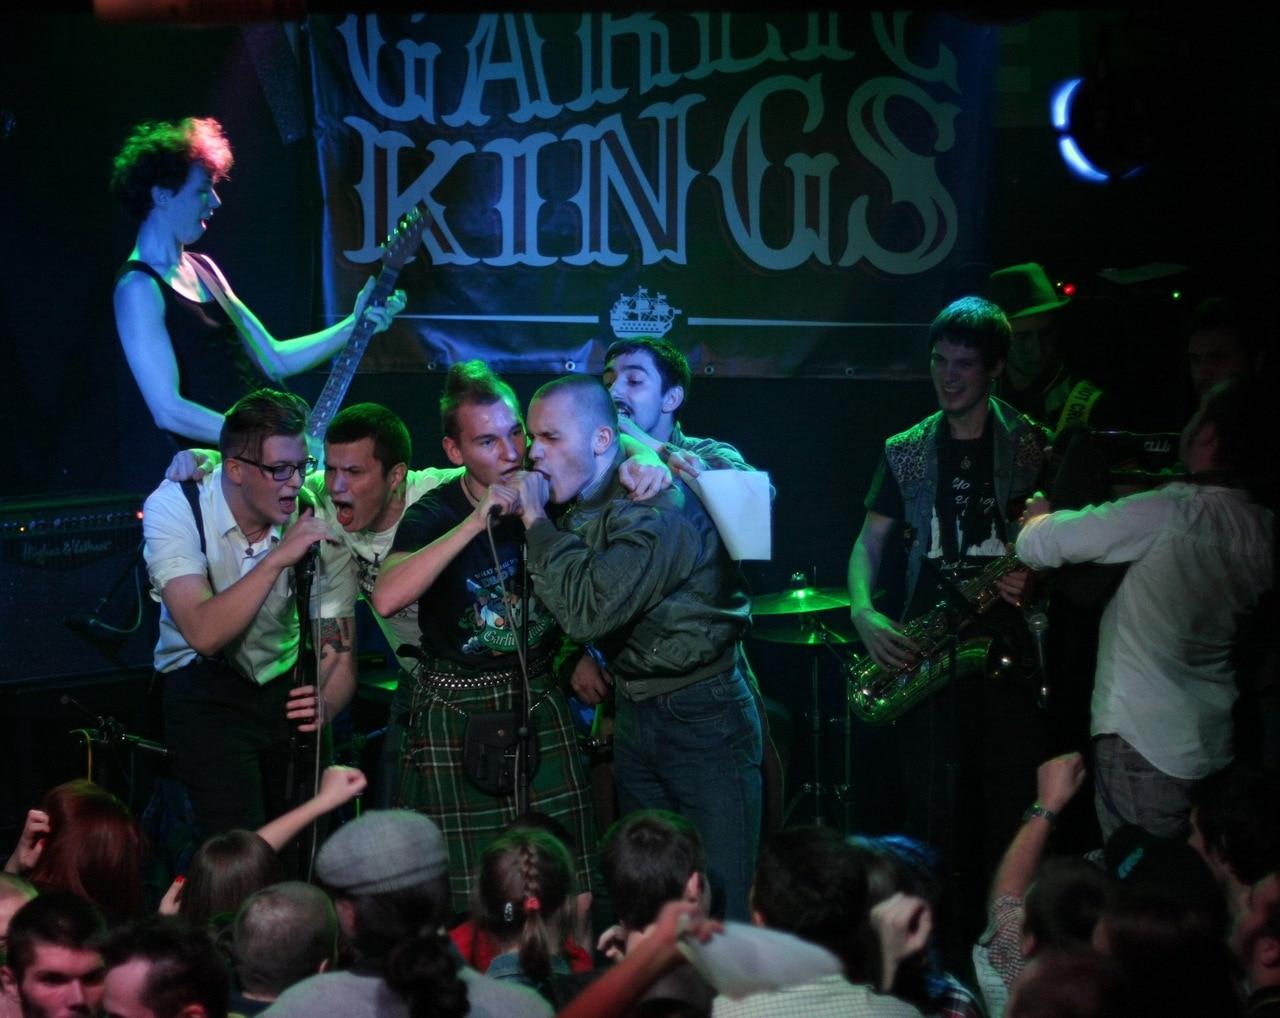 03 ноября 2014. Garlic Kings. Rock House